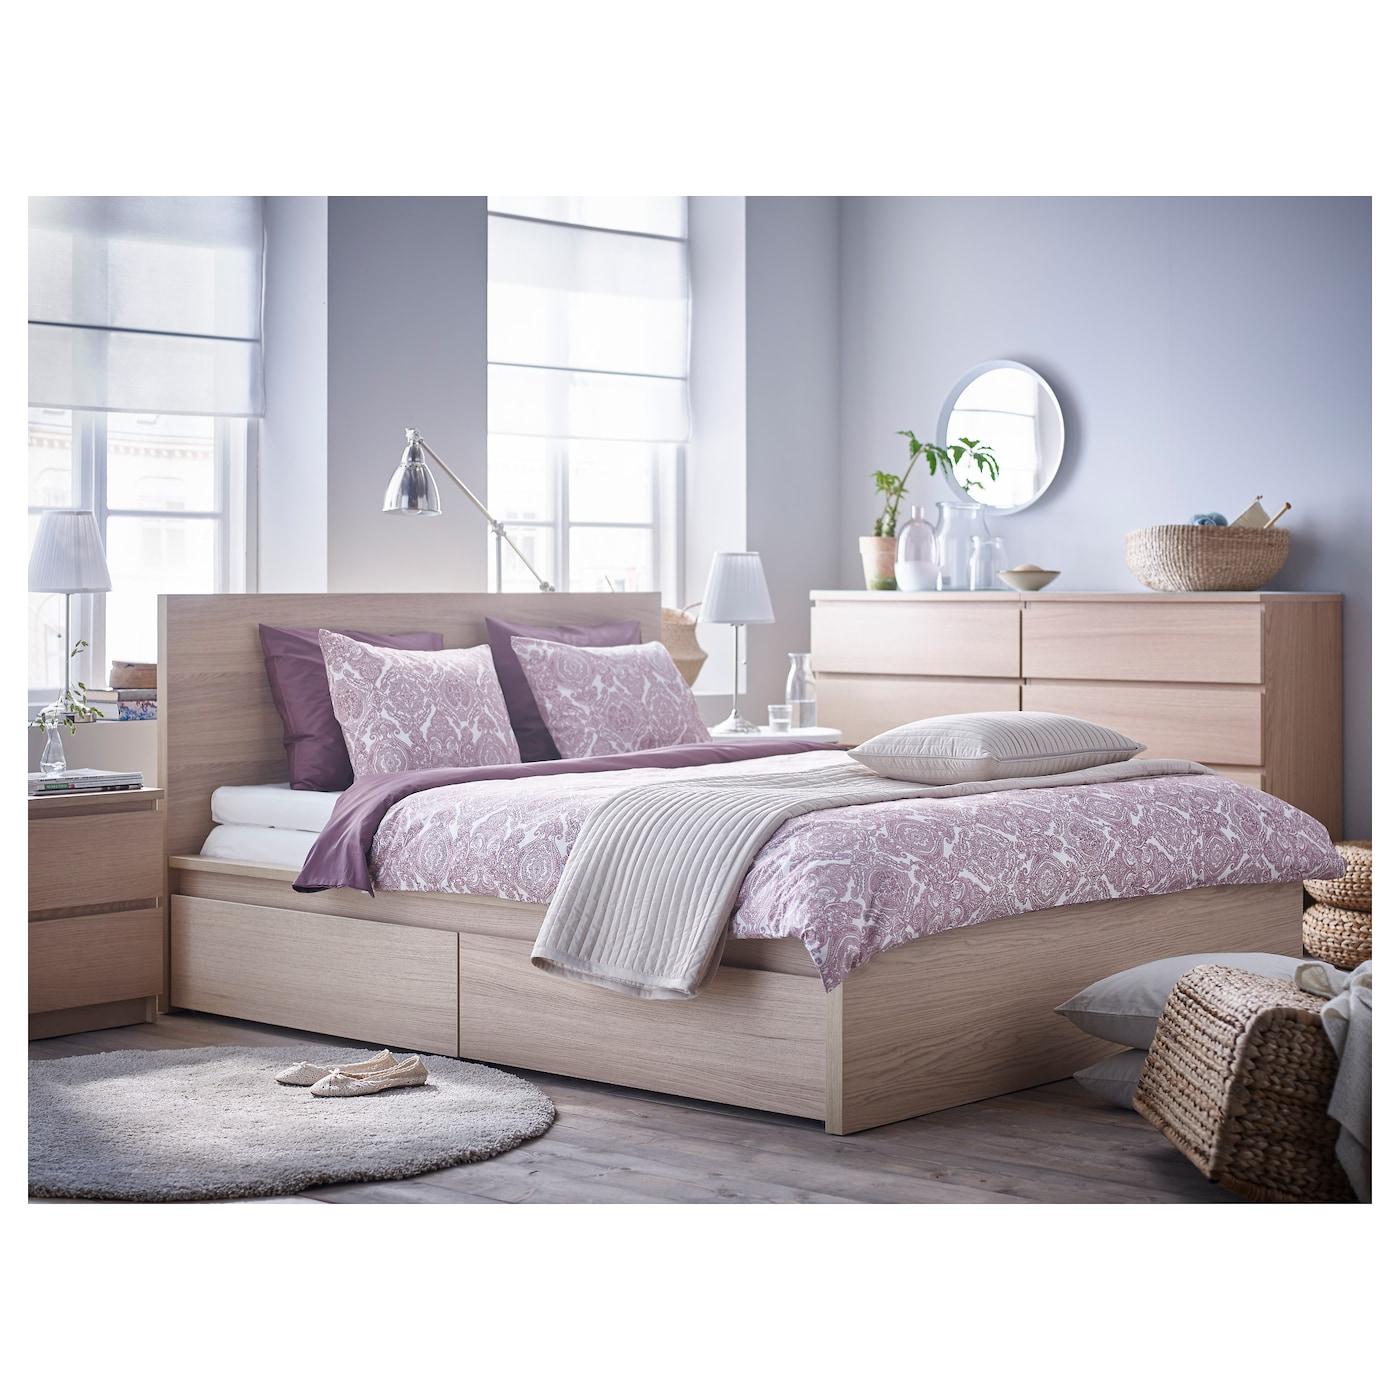 ikea malm bed white